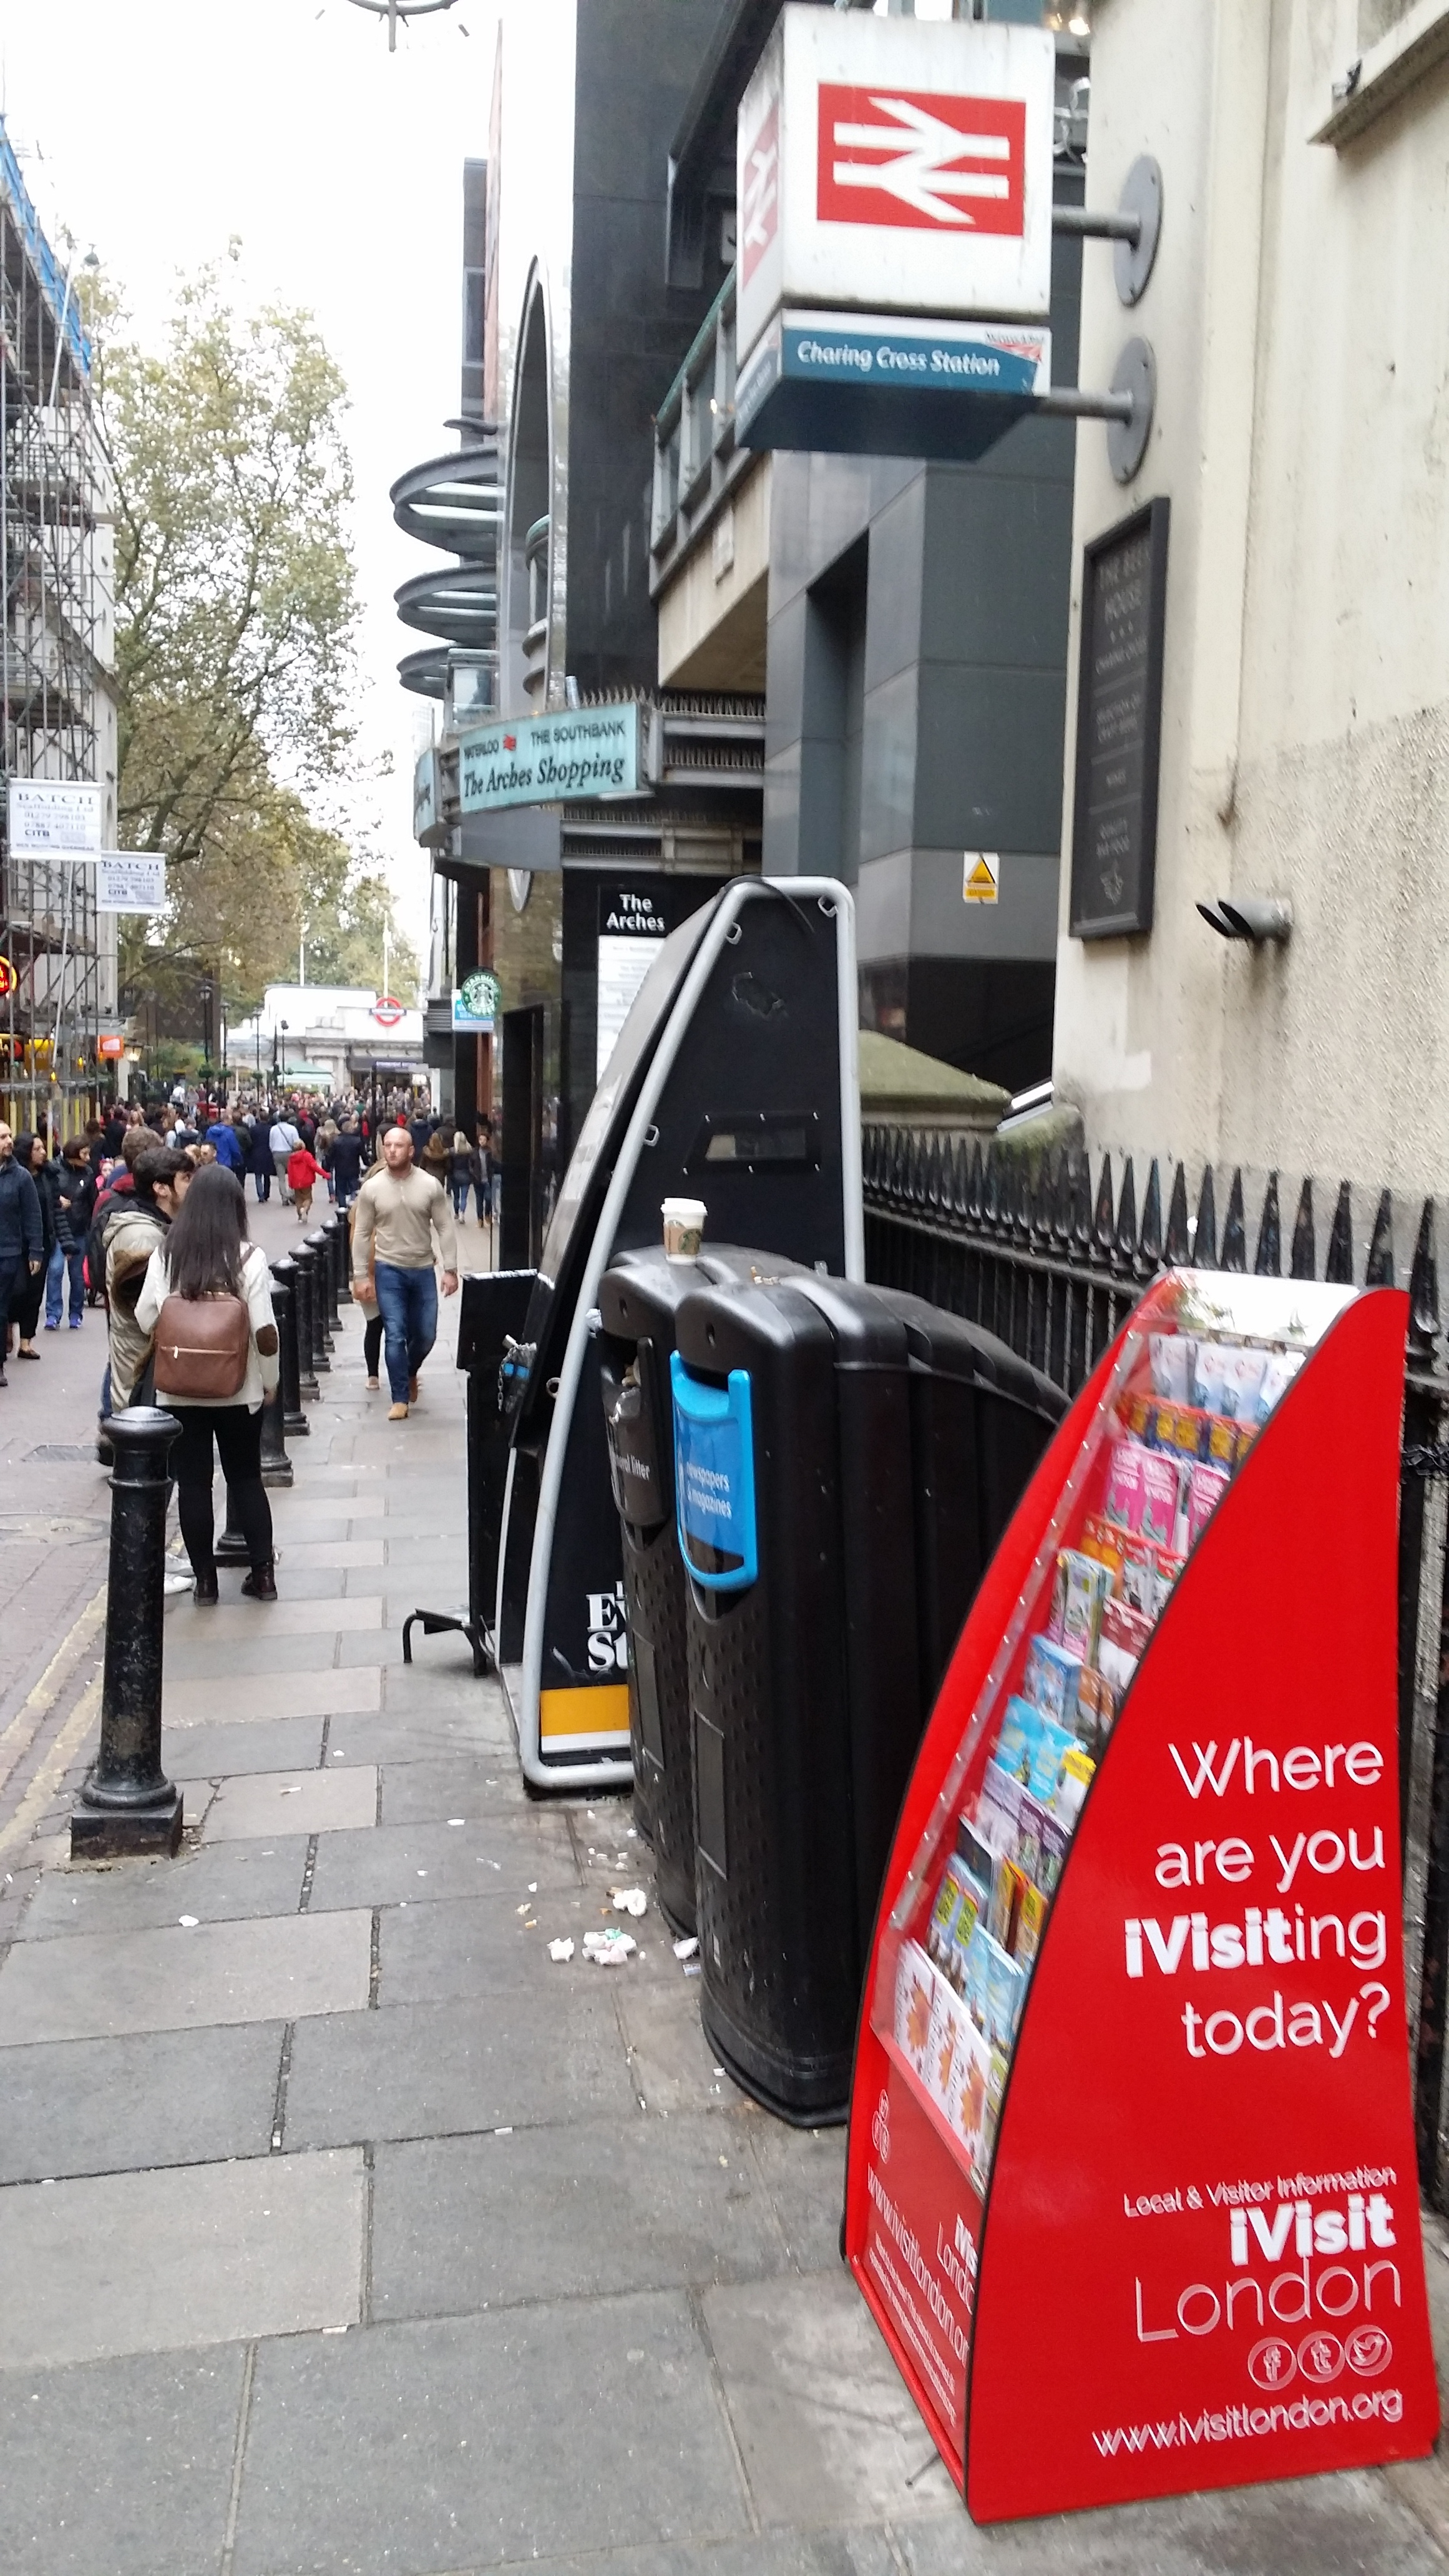 Embankment Charing Cross.jpg